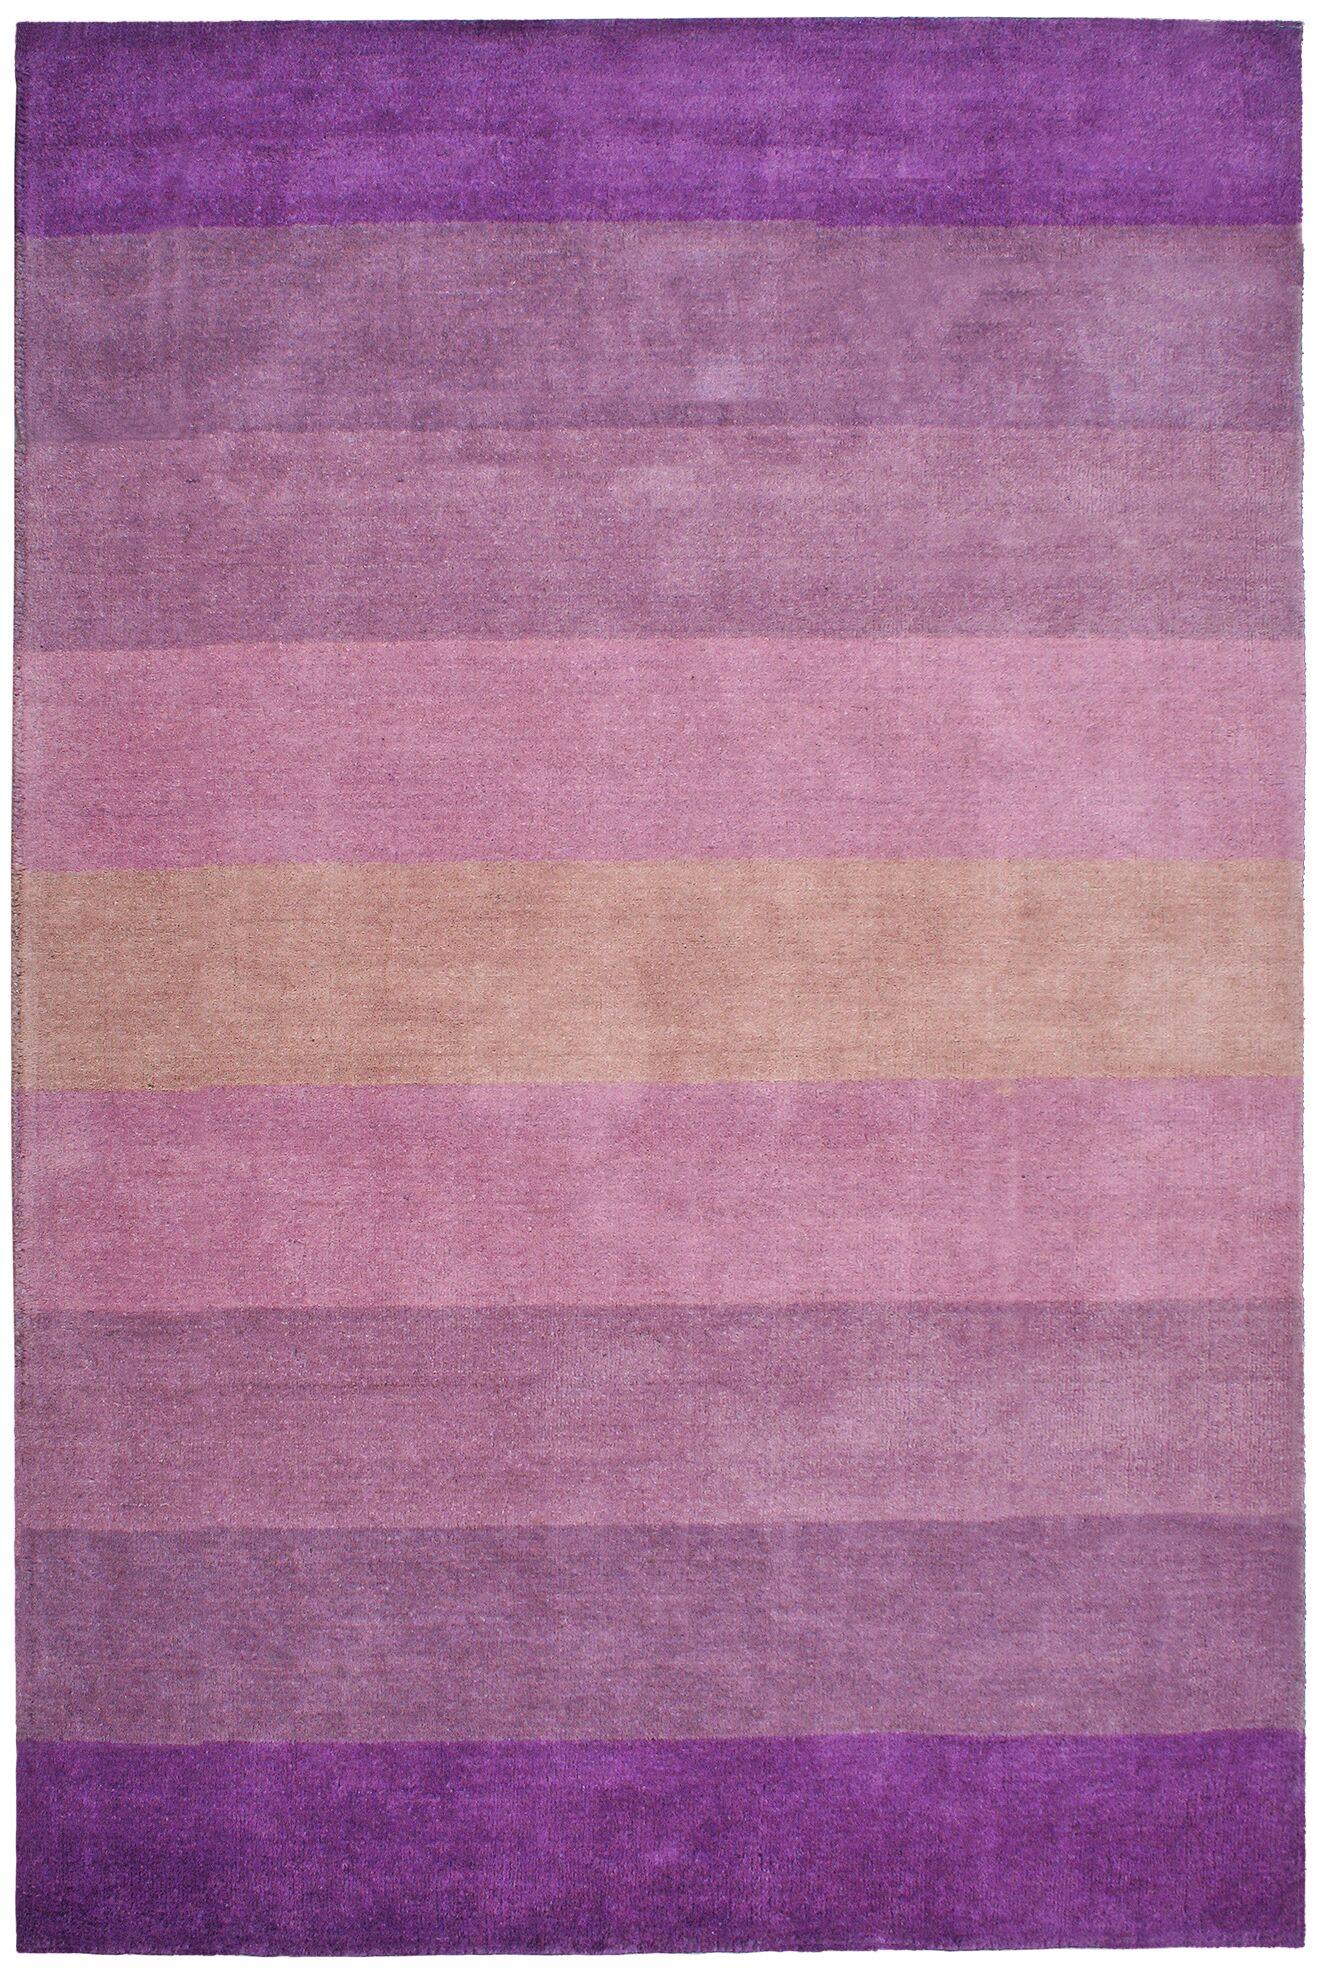 Degarmo Purple Stripes Area Rug Rug Size: Rectangle 5' x 8'